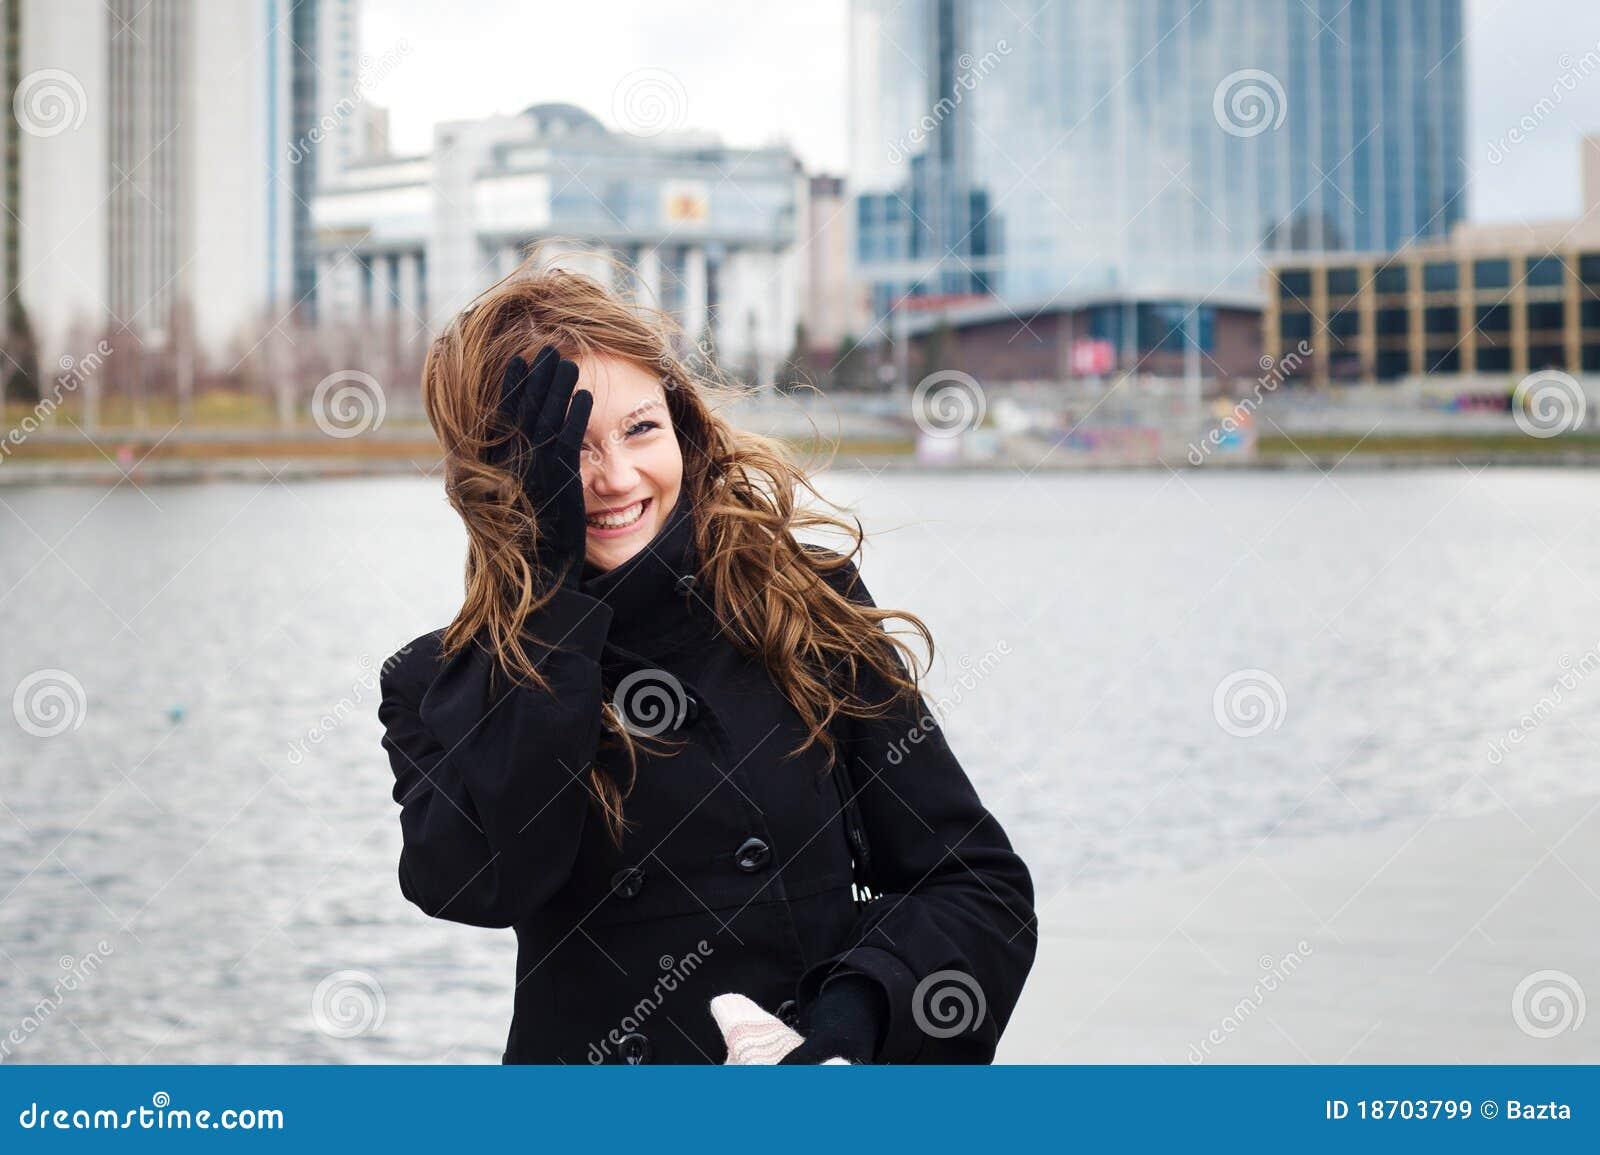 Funny portrait of girl